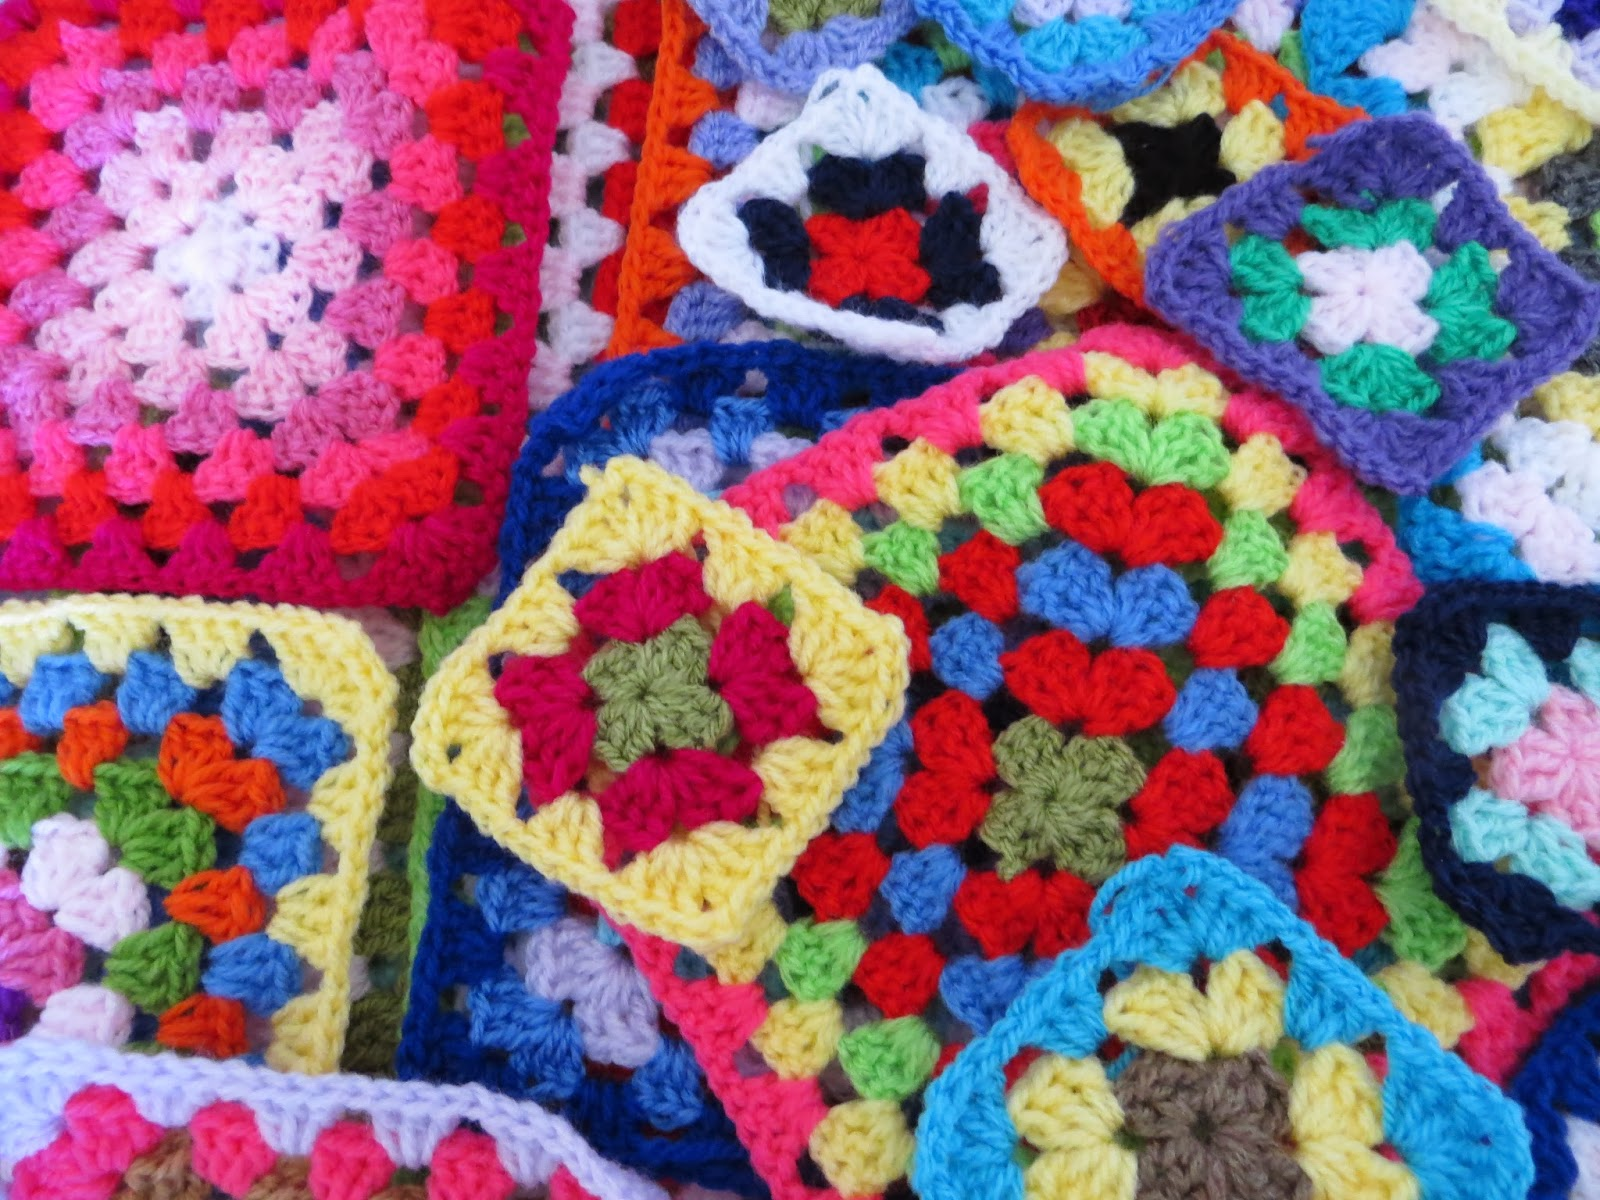 Crocheting Crazy : Shortbread & Ginger: Going Crochet Crazy!